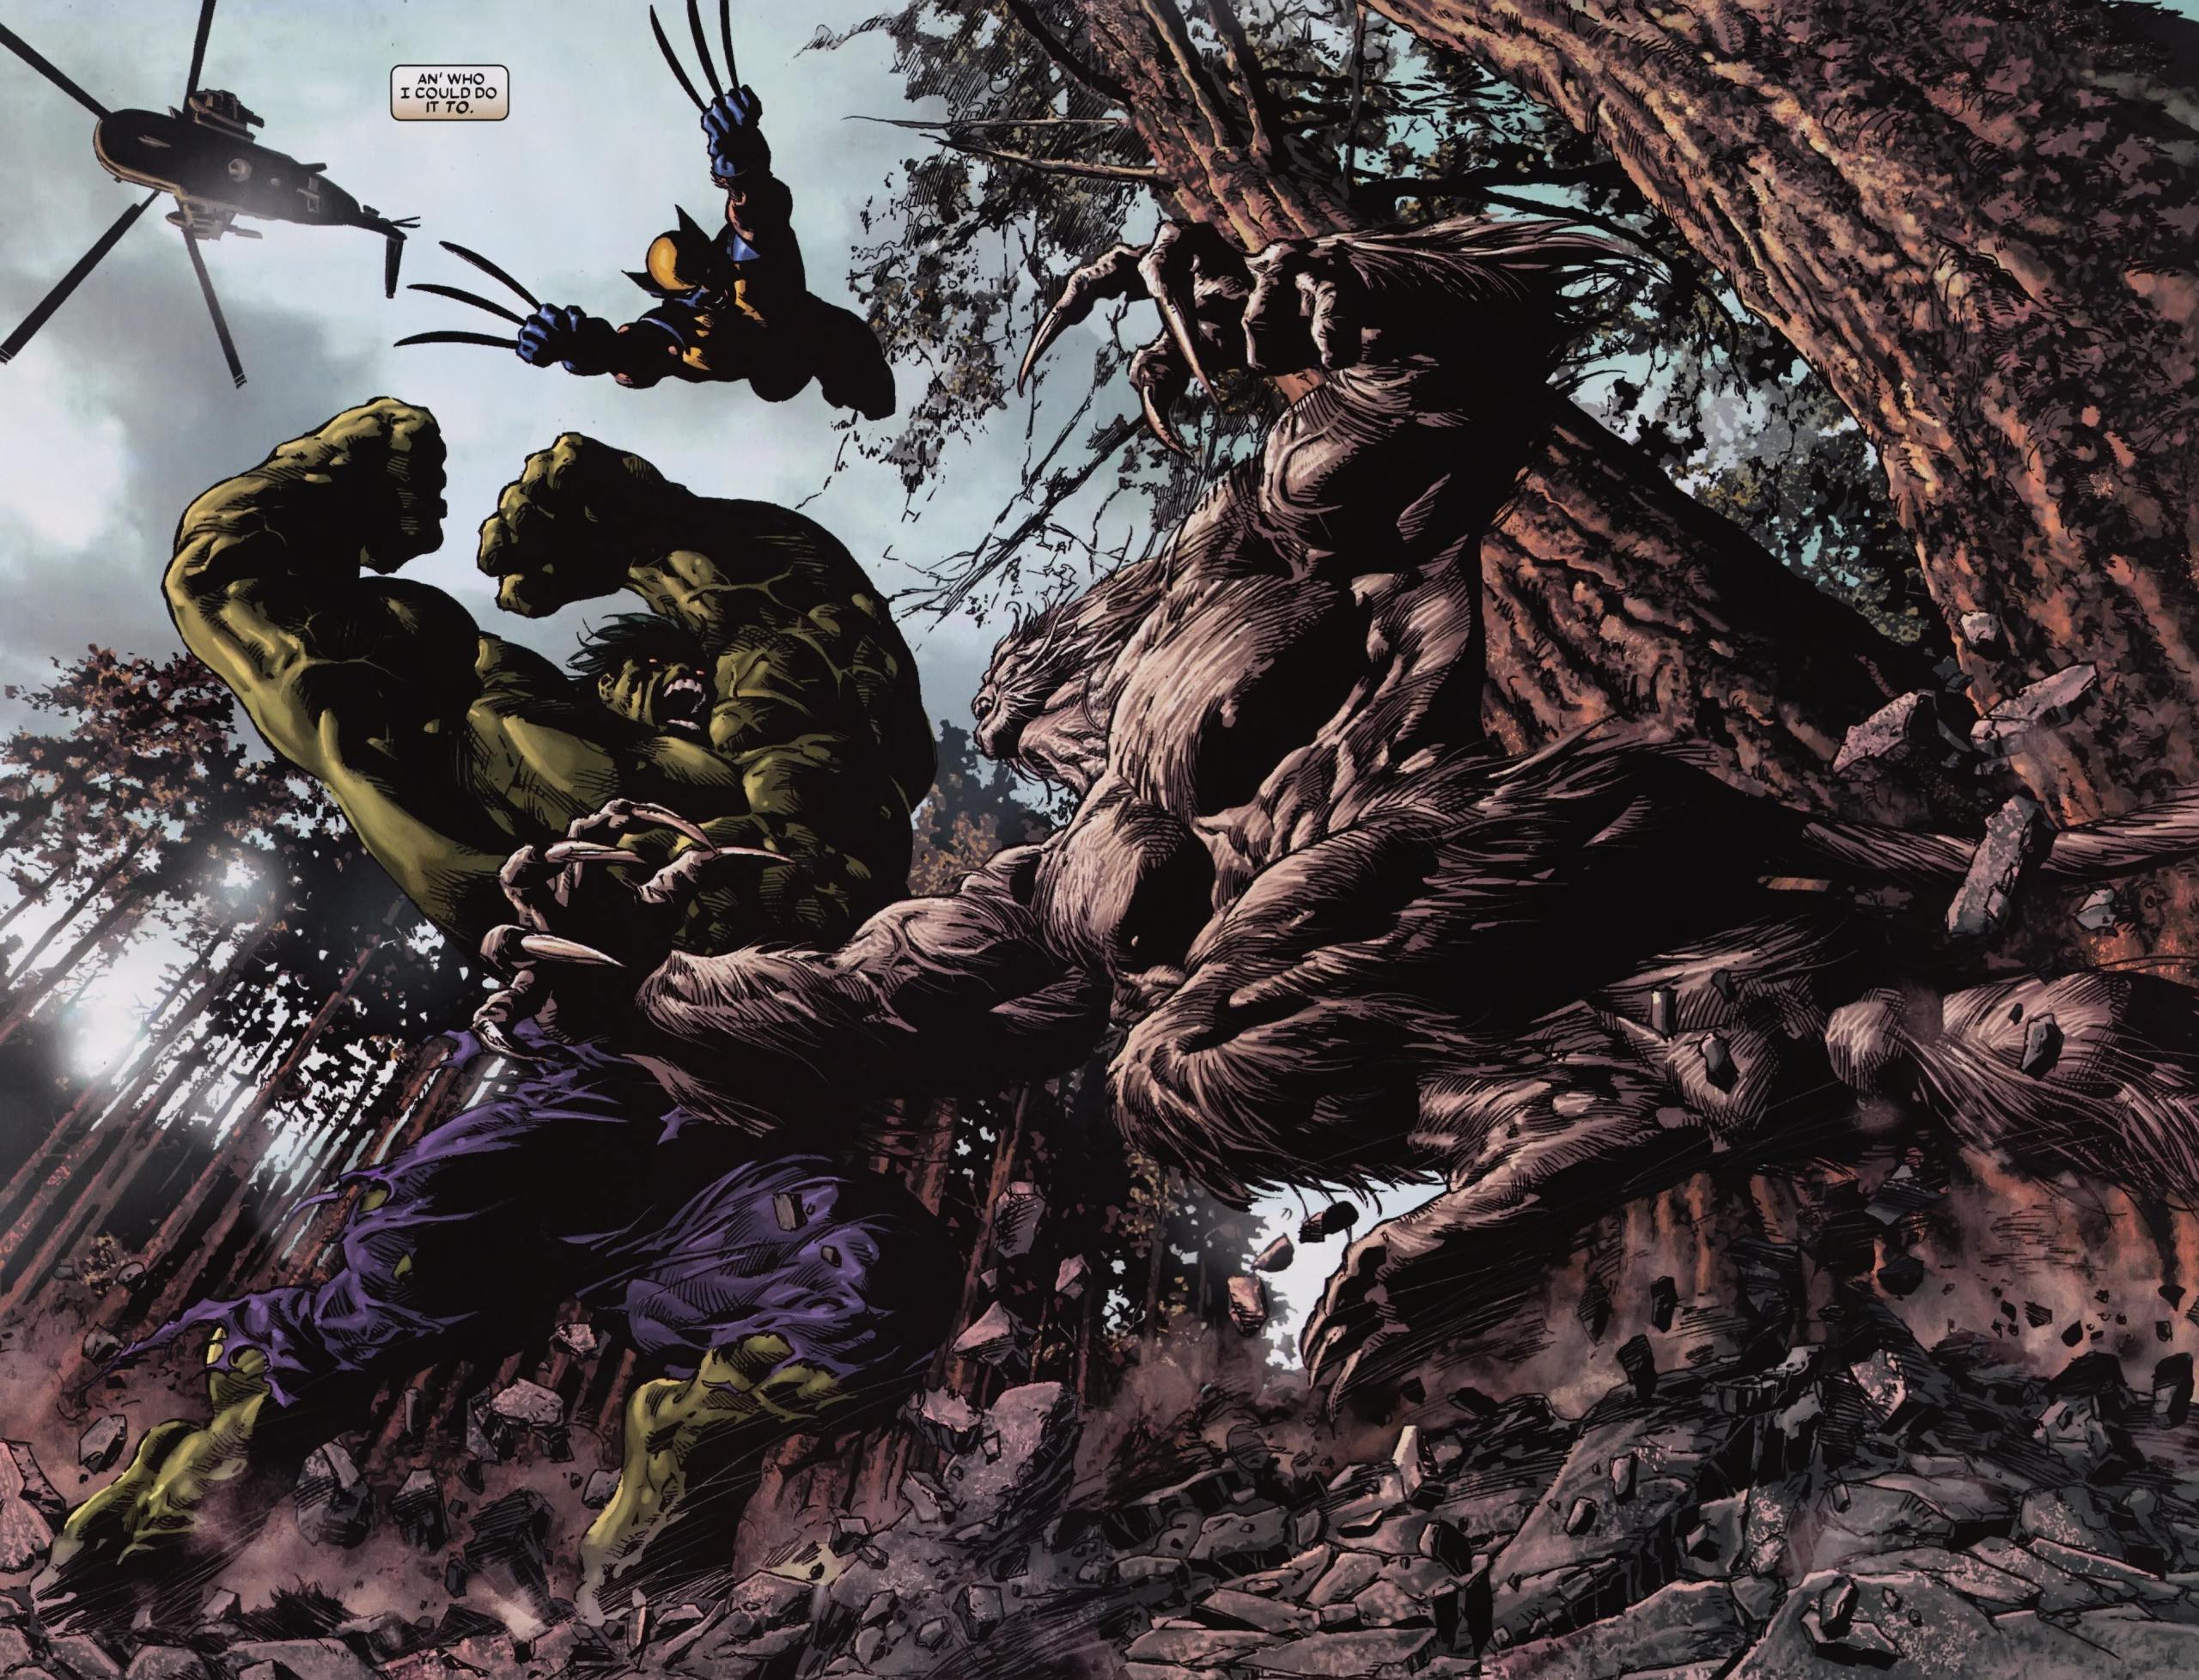 Comics marvel wolverine hulk wolverine hulk super heroes battle 2560x1956